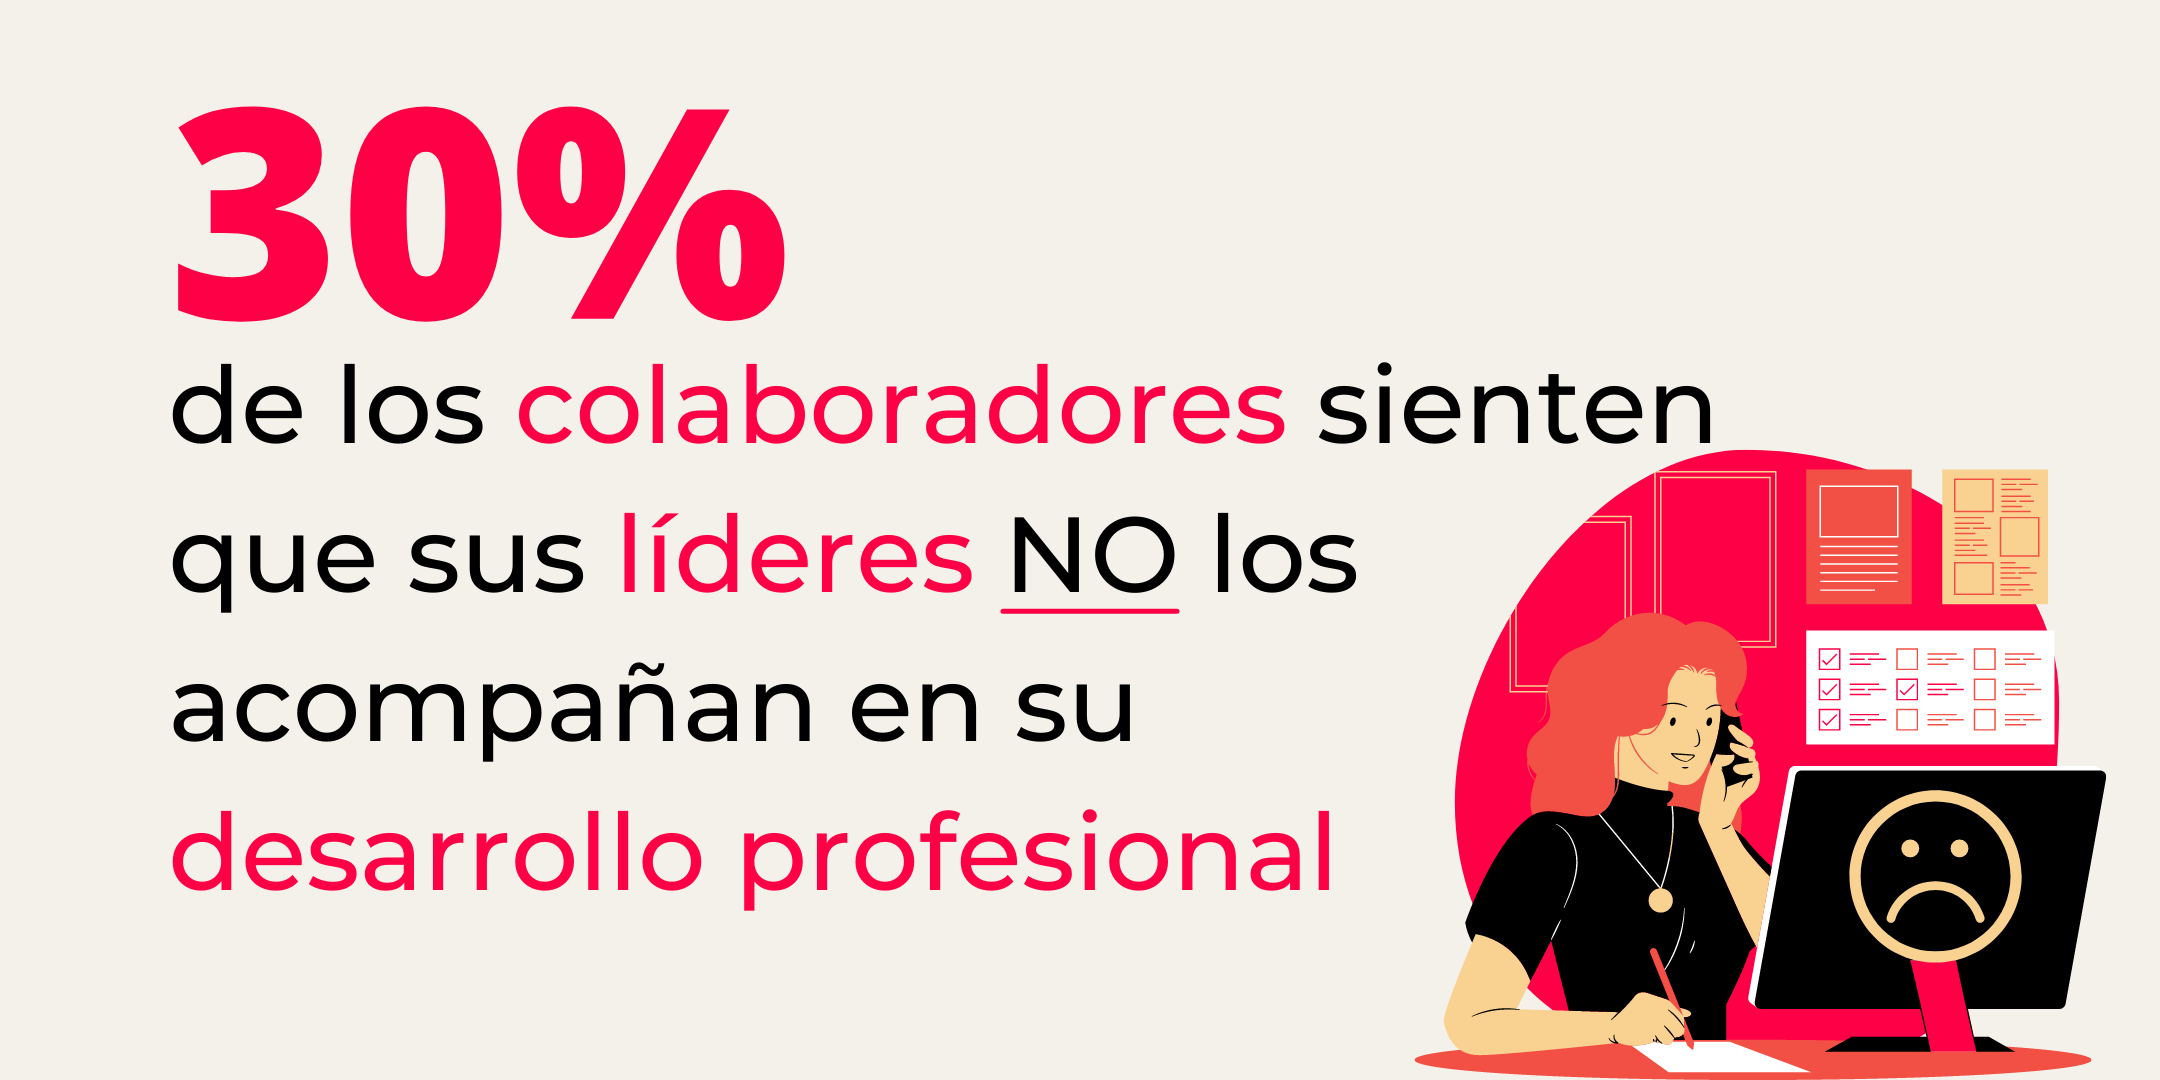 Desarrollo Profesional 30%